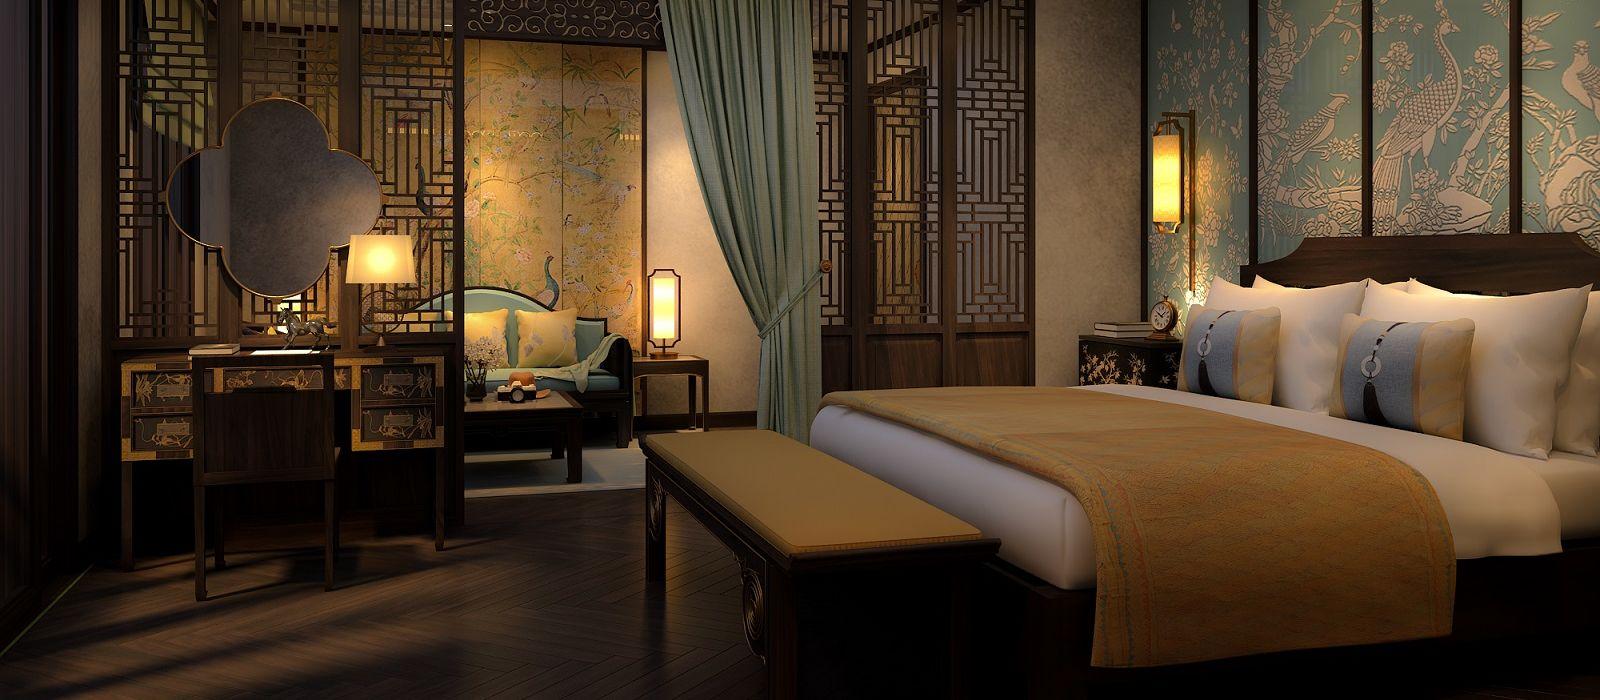 Hotel Ginger Cruise Halong Bay Vietnam